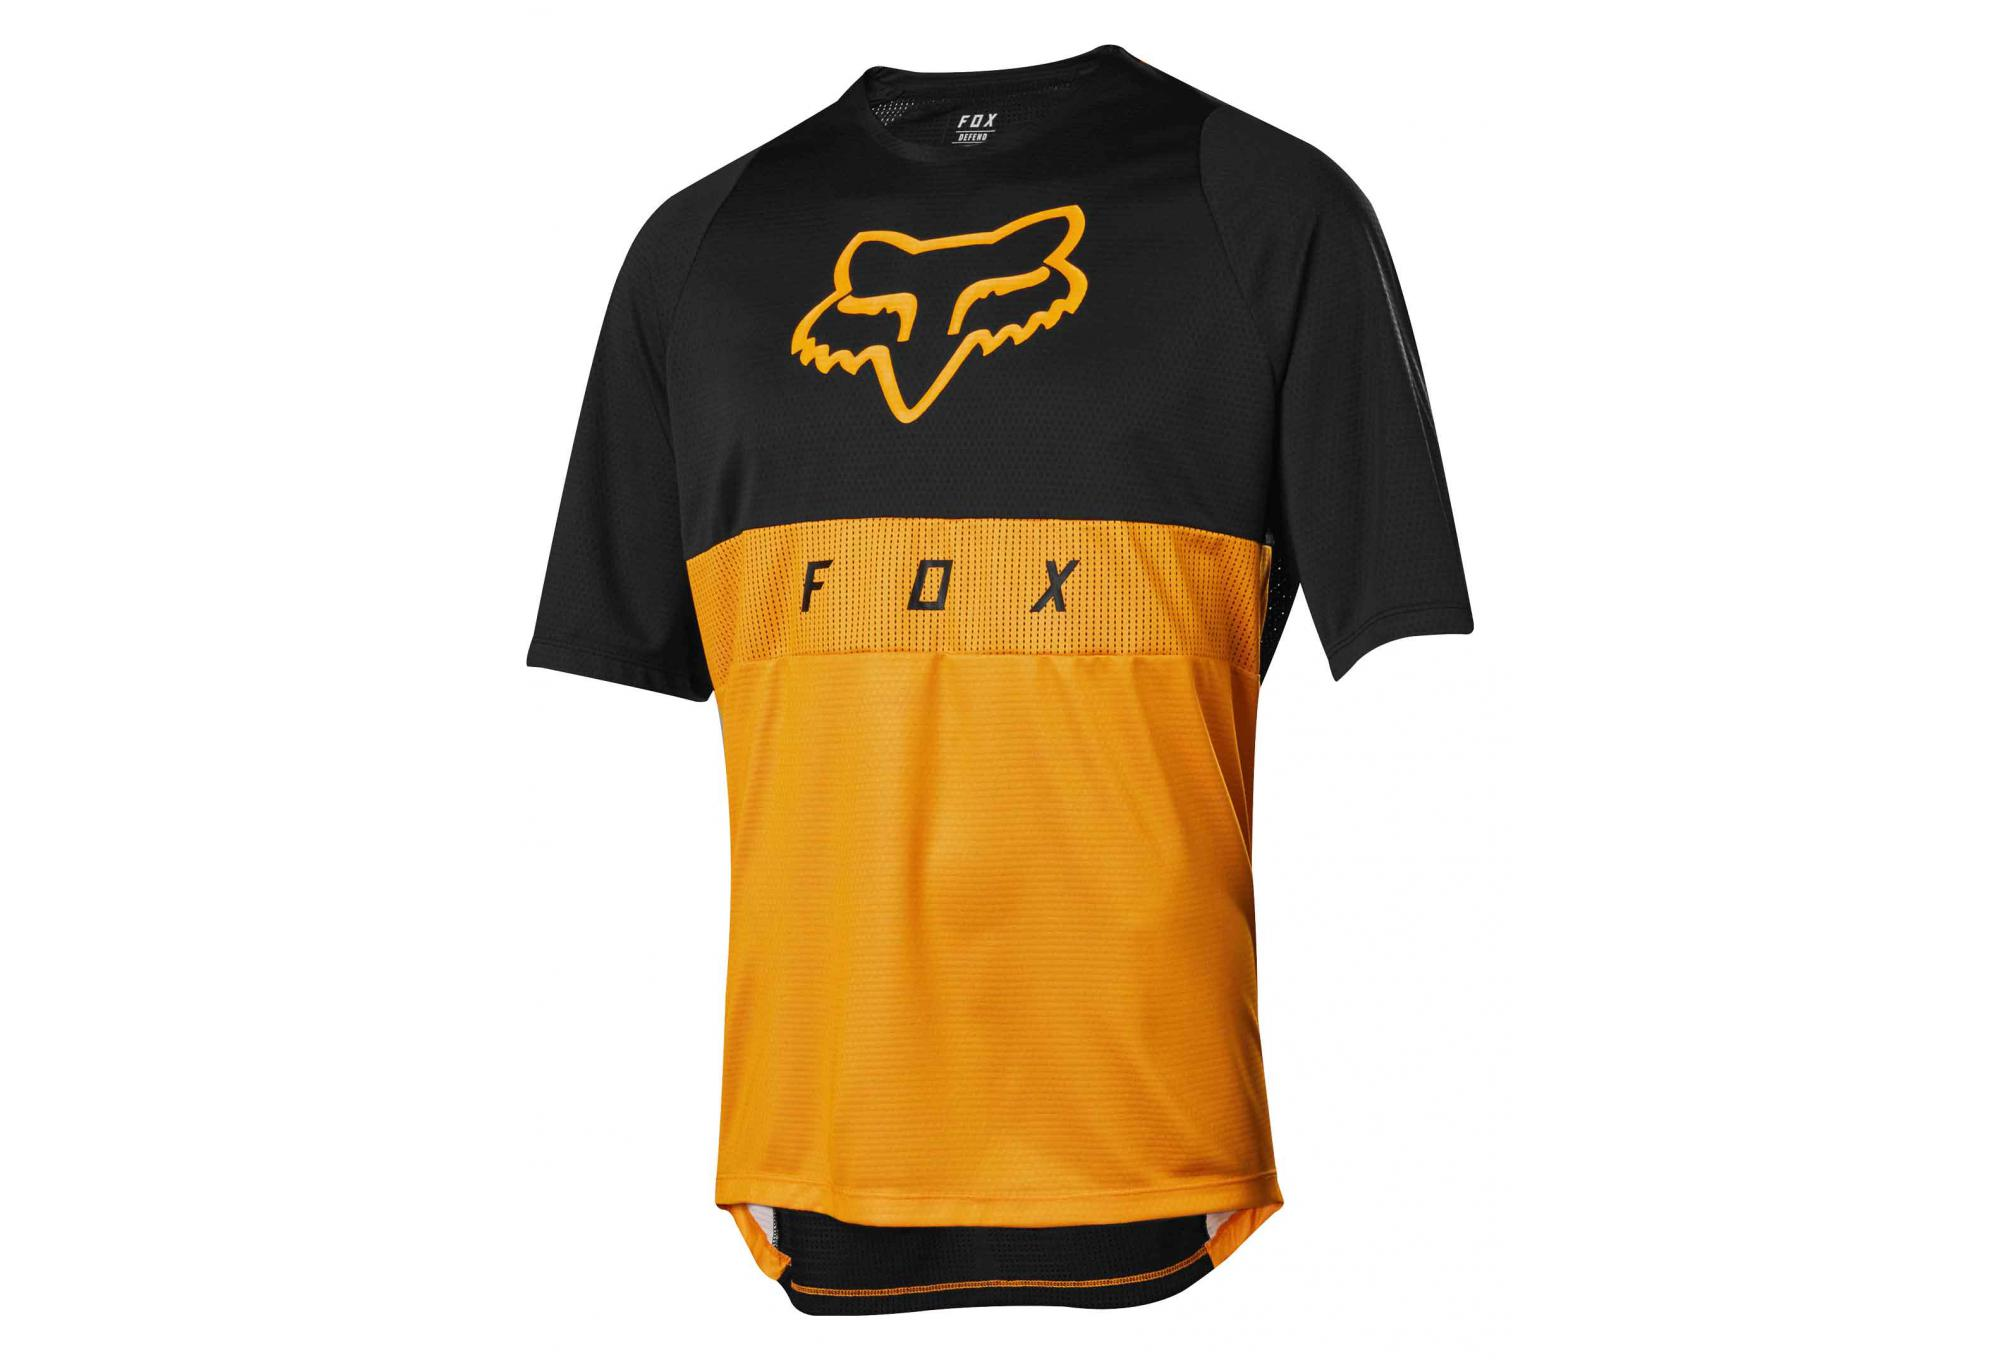 Maillot manches courtes Fox maillot cyclisme TLD T-shirt VTT maillot de course